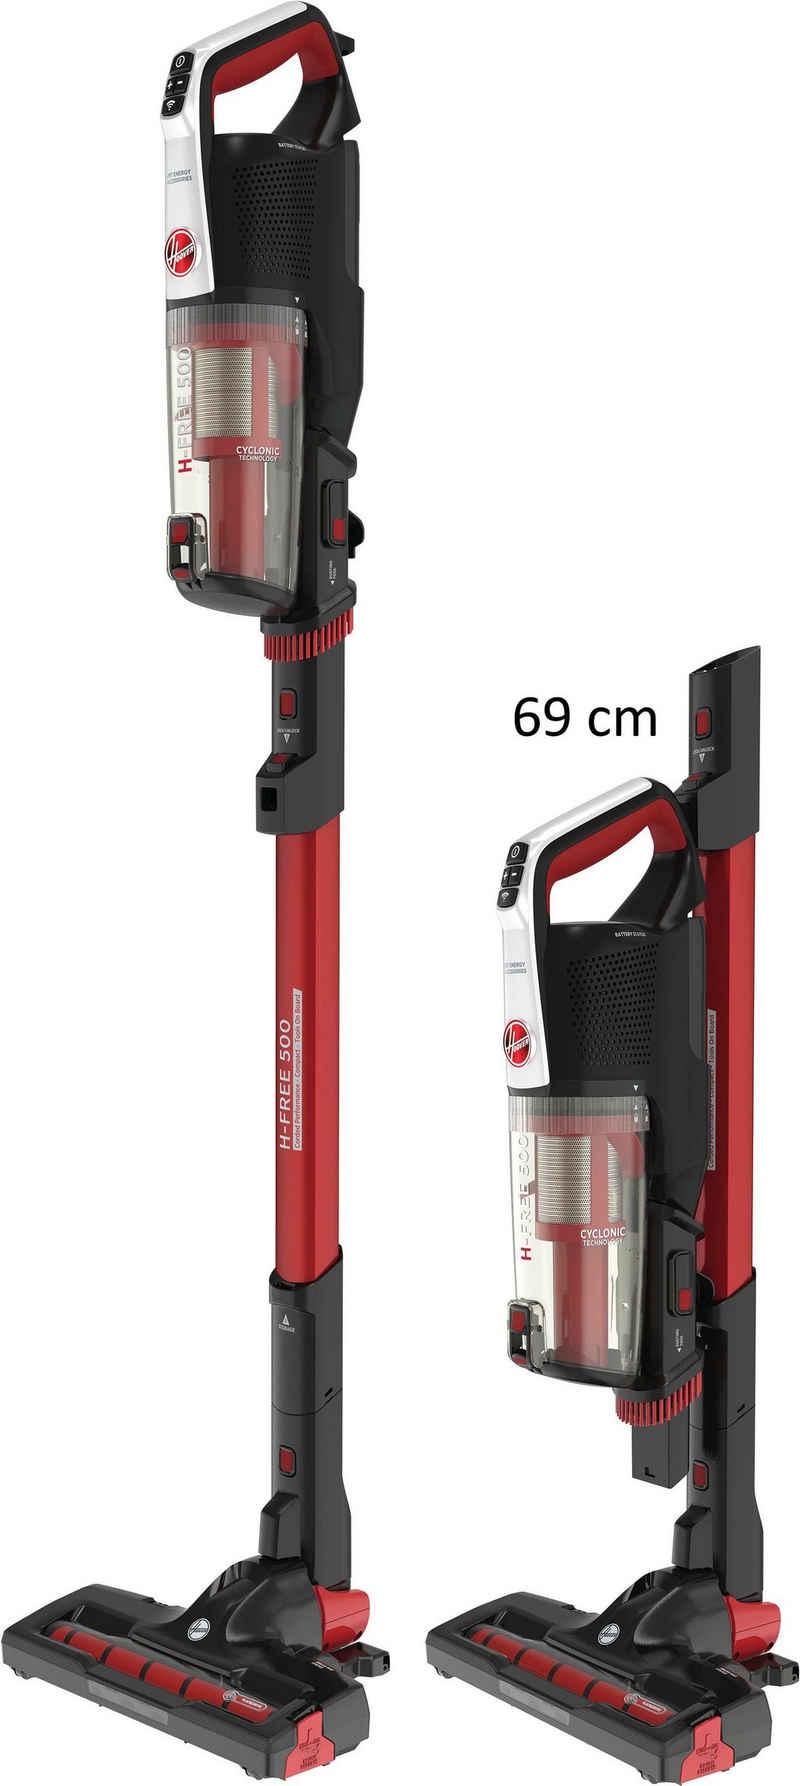 Hoover Akku-Stielstaubsauger H-FREE 500 Compact Connected Power, HF522REW 011, beutellos